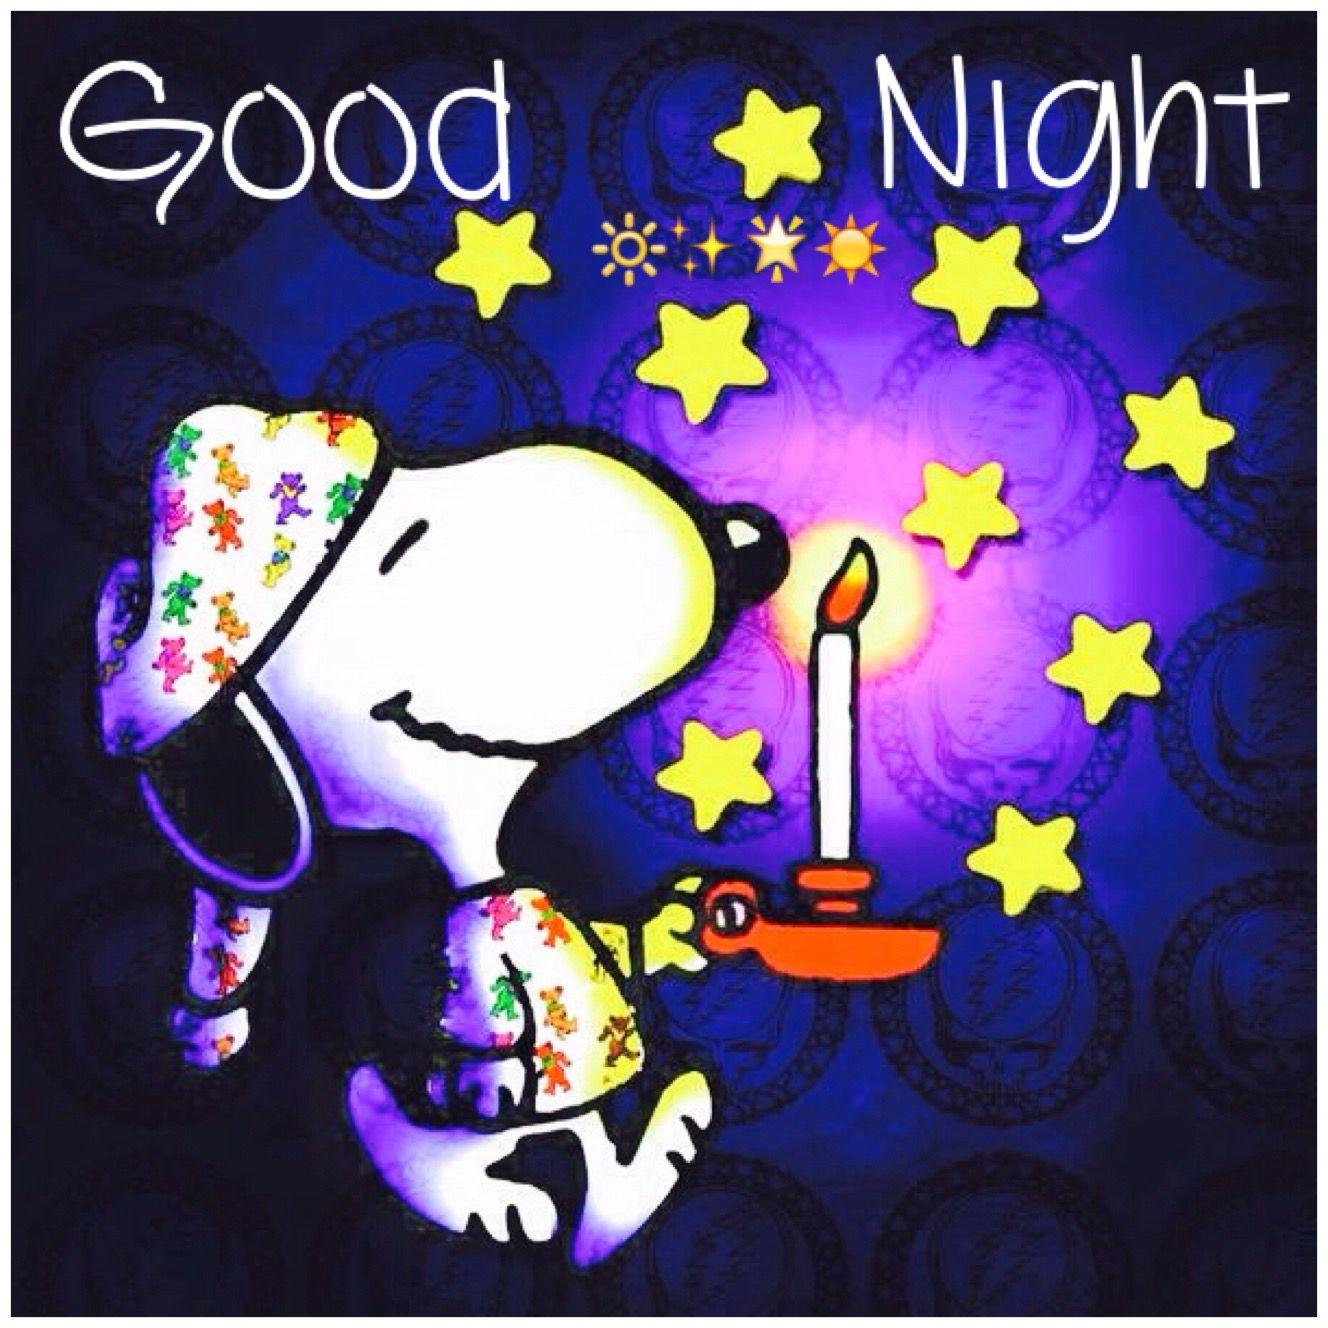 Goodnight Snoopy, Snoopy Funny, Snoopy